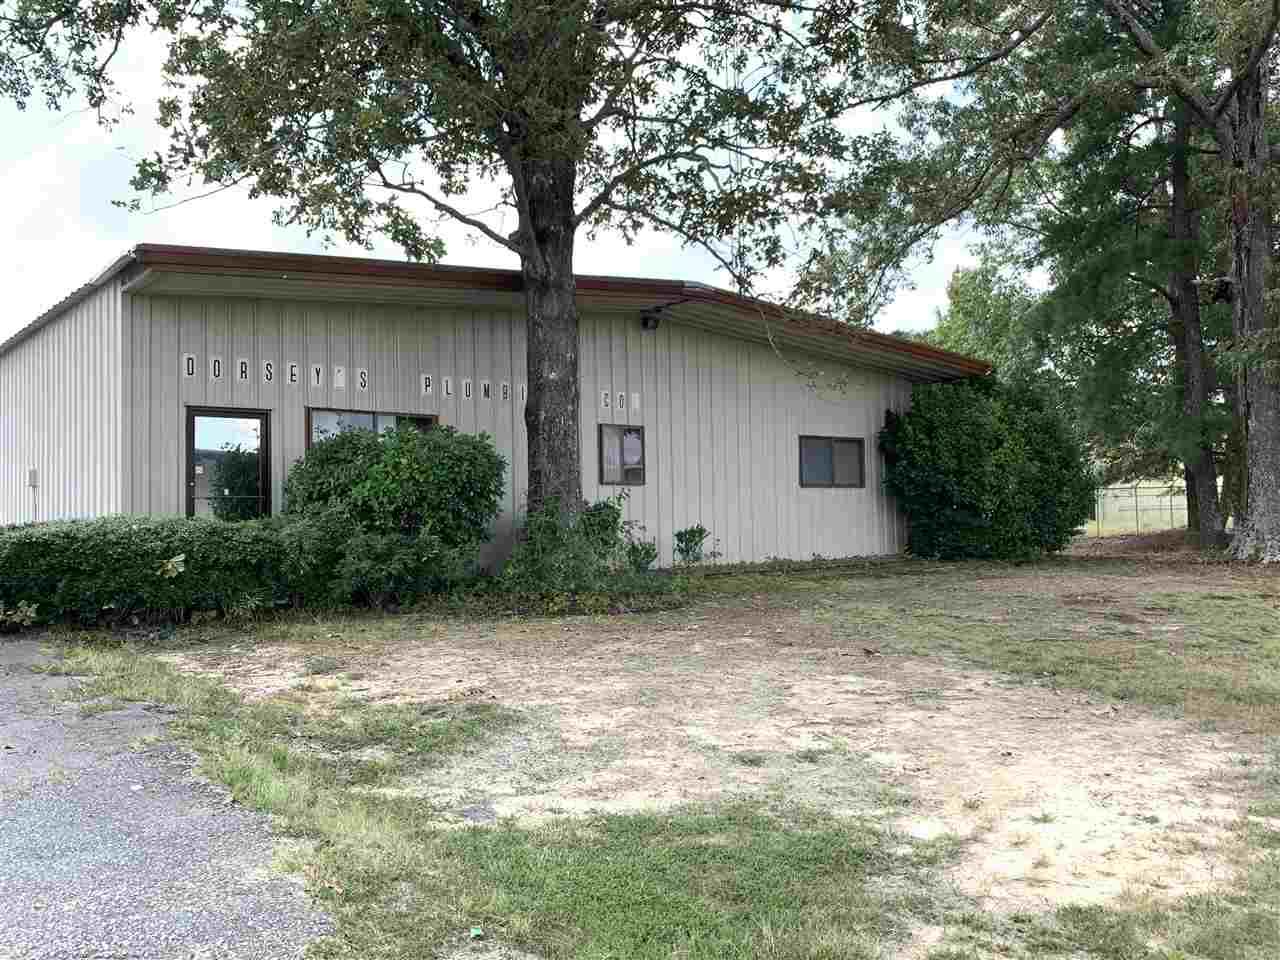 3024 Midland Drive South #No, Pine Bluff, AR 71603